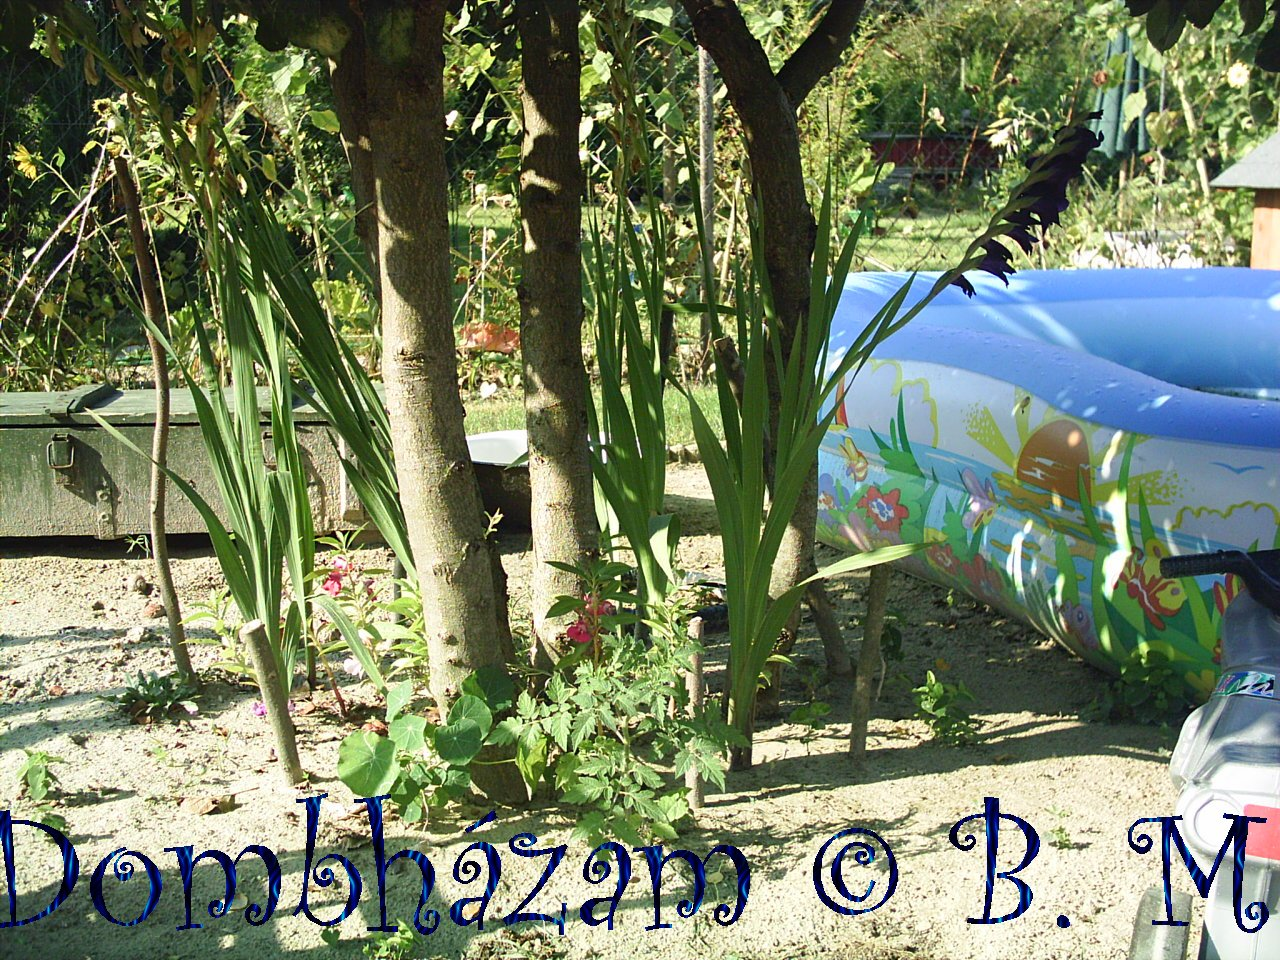 2008_08_22-09h_09m_42s.JPG